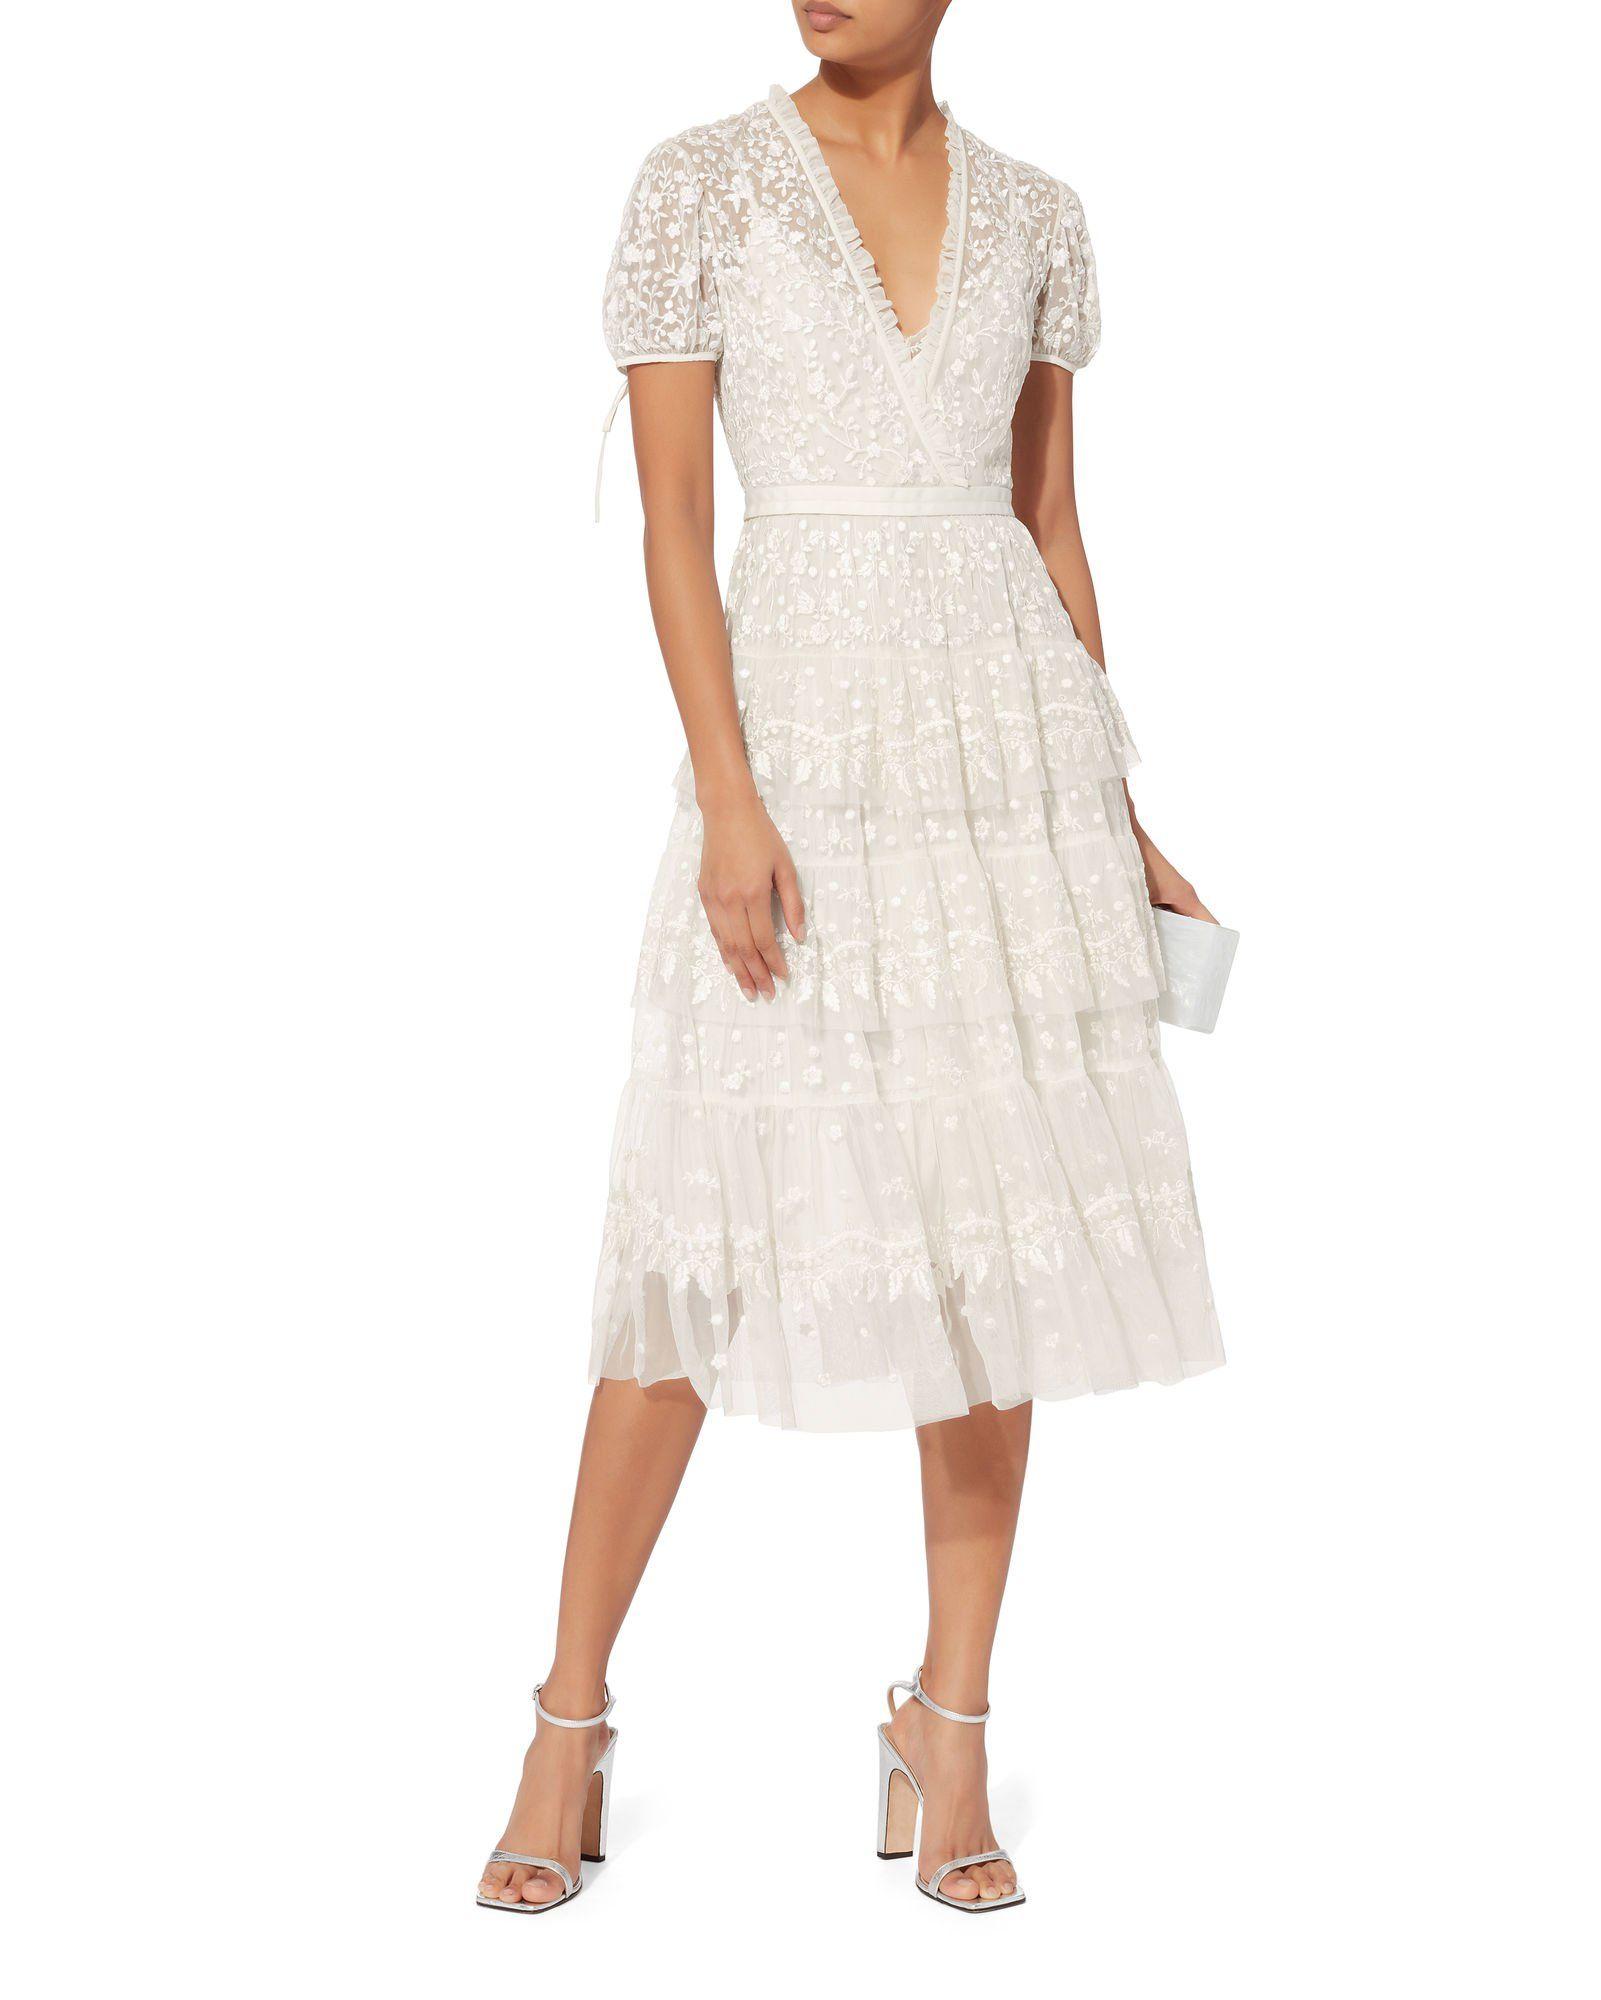 Layered Lace Midi Dress In 2020 Dresses Lace Midi Dress Off White Dresses [ 2000 x 1601 Pixel ]